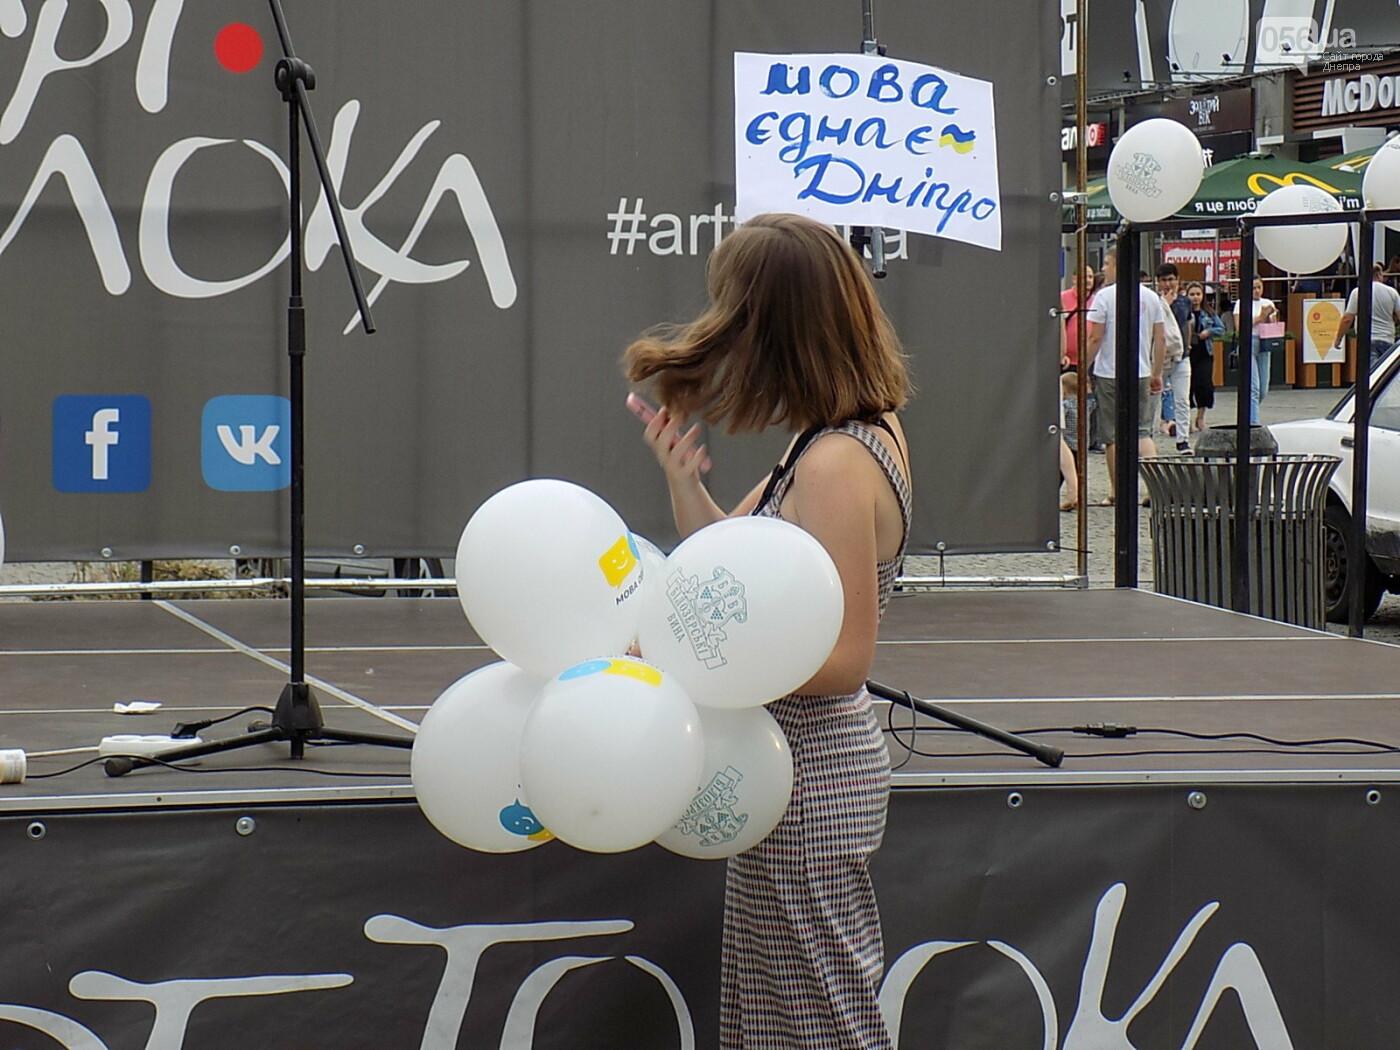 """Мова єднає Дніпро"": в центре города прошла символическая акция с концертом и подарками, - ФОТО, фото-3"